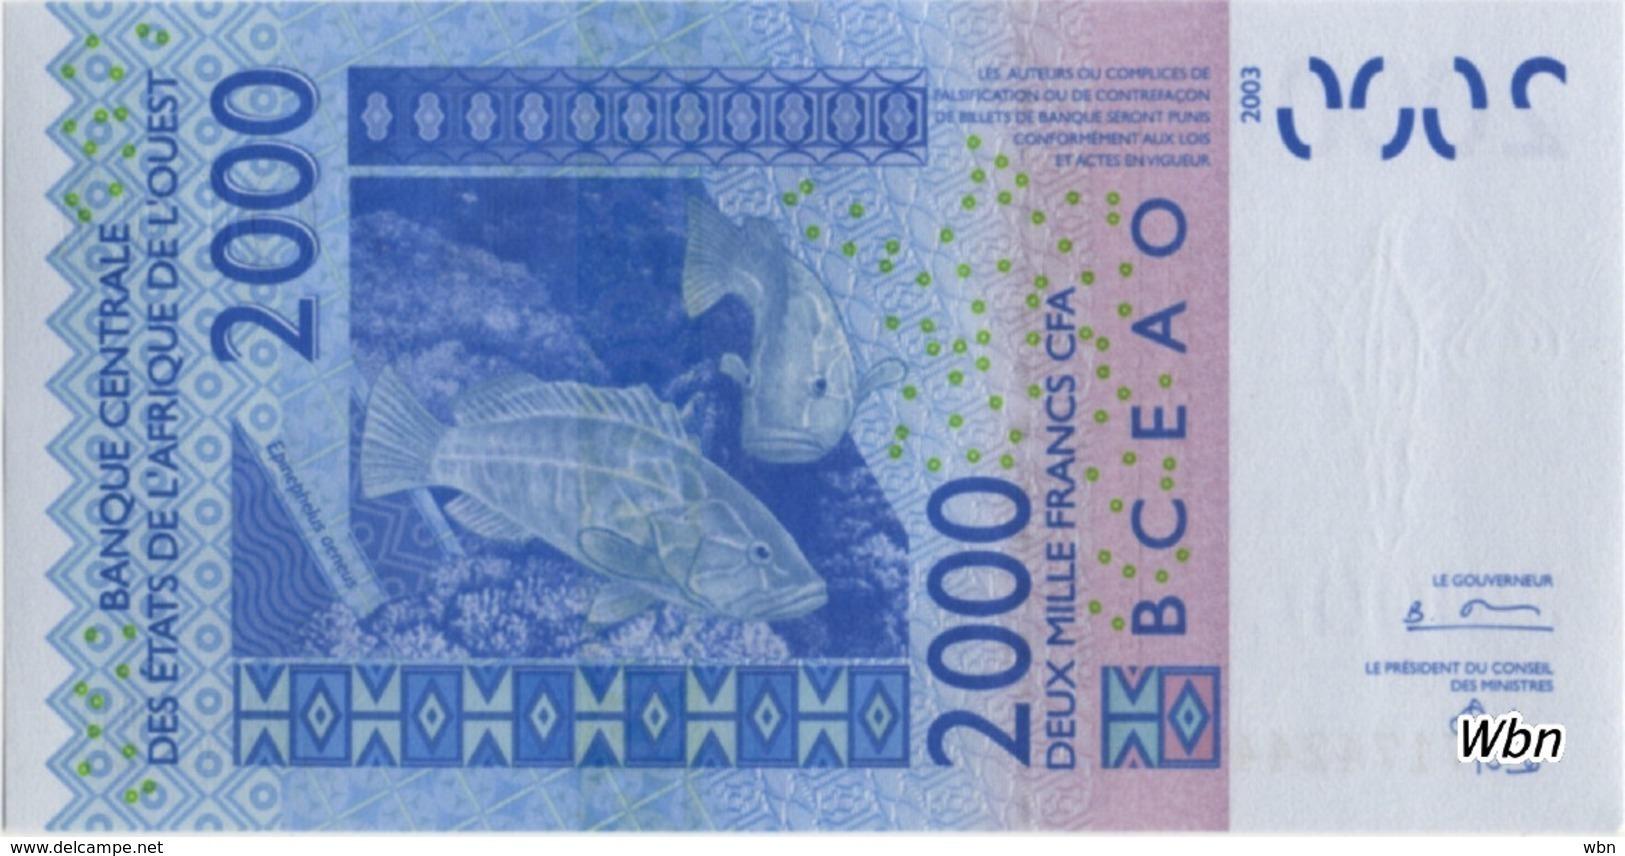 Togo 2000 Francs (P816T) Letter T 2004 -UNC- - Togo